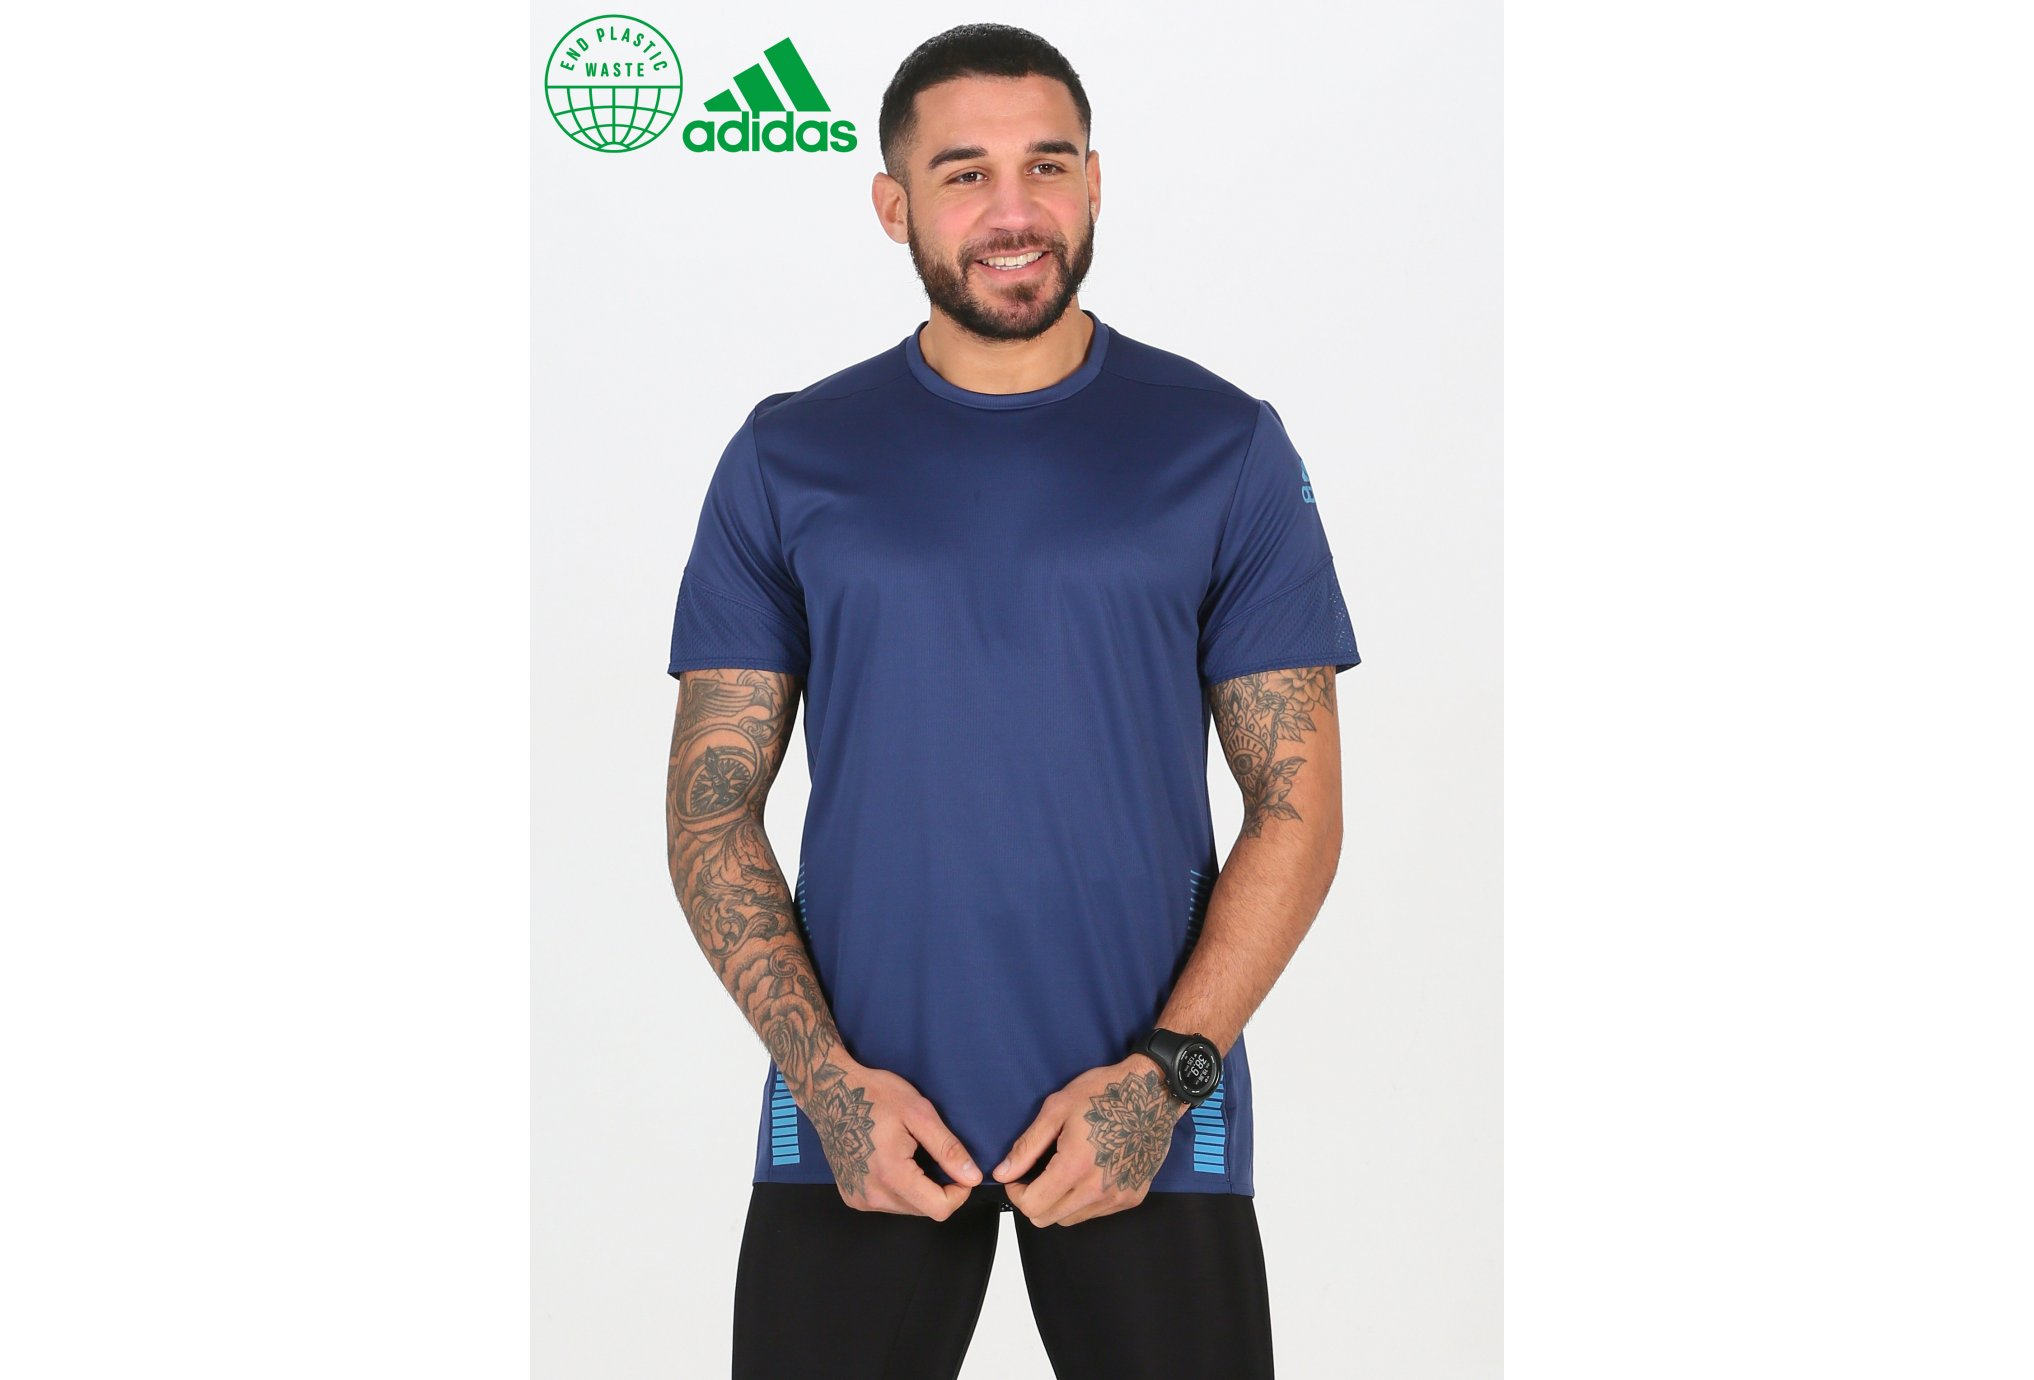 adidas 25/7 Rise Up N Run Parley M vêtement running homme